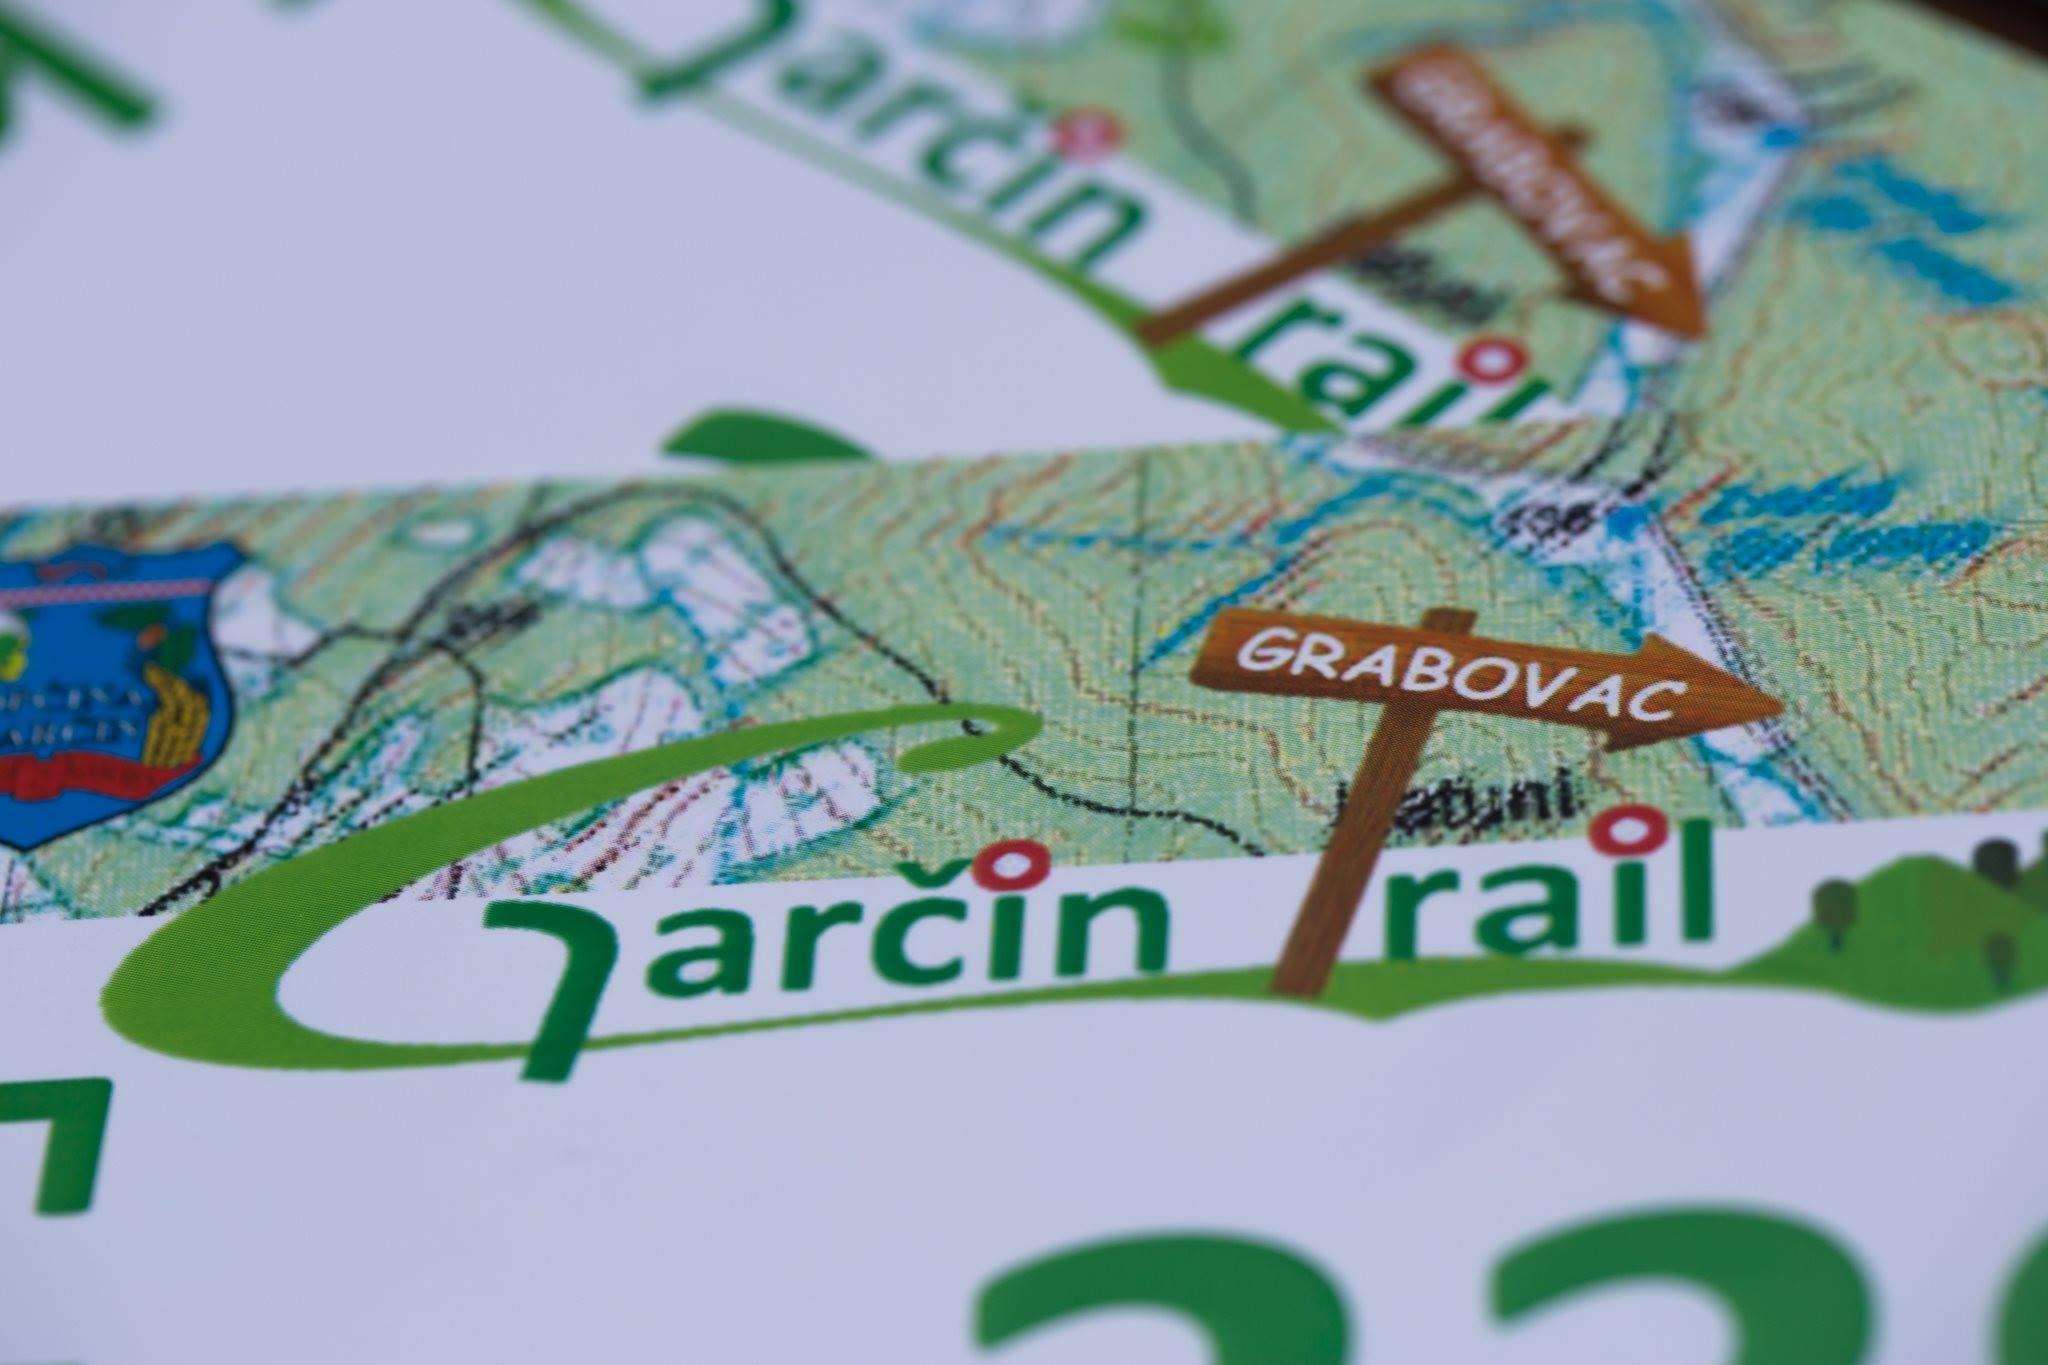 Prvi Garčin trail 2020 održan je jučer na izletištu Grabovac